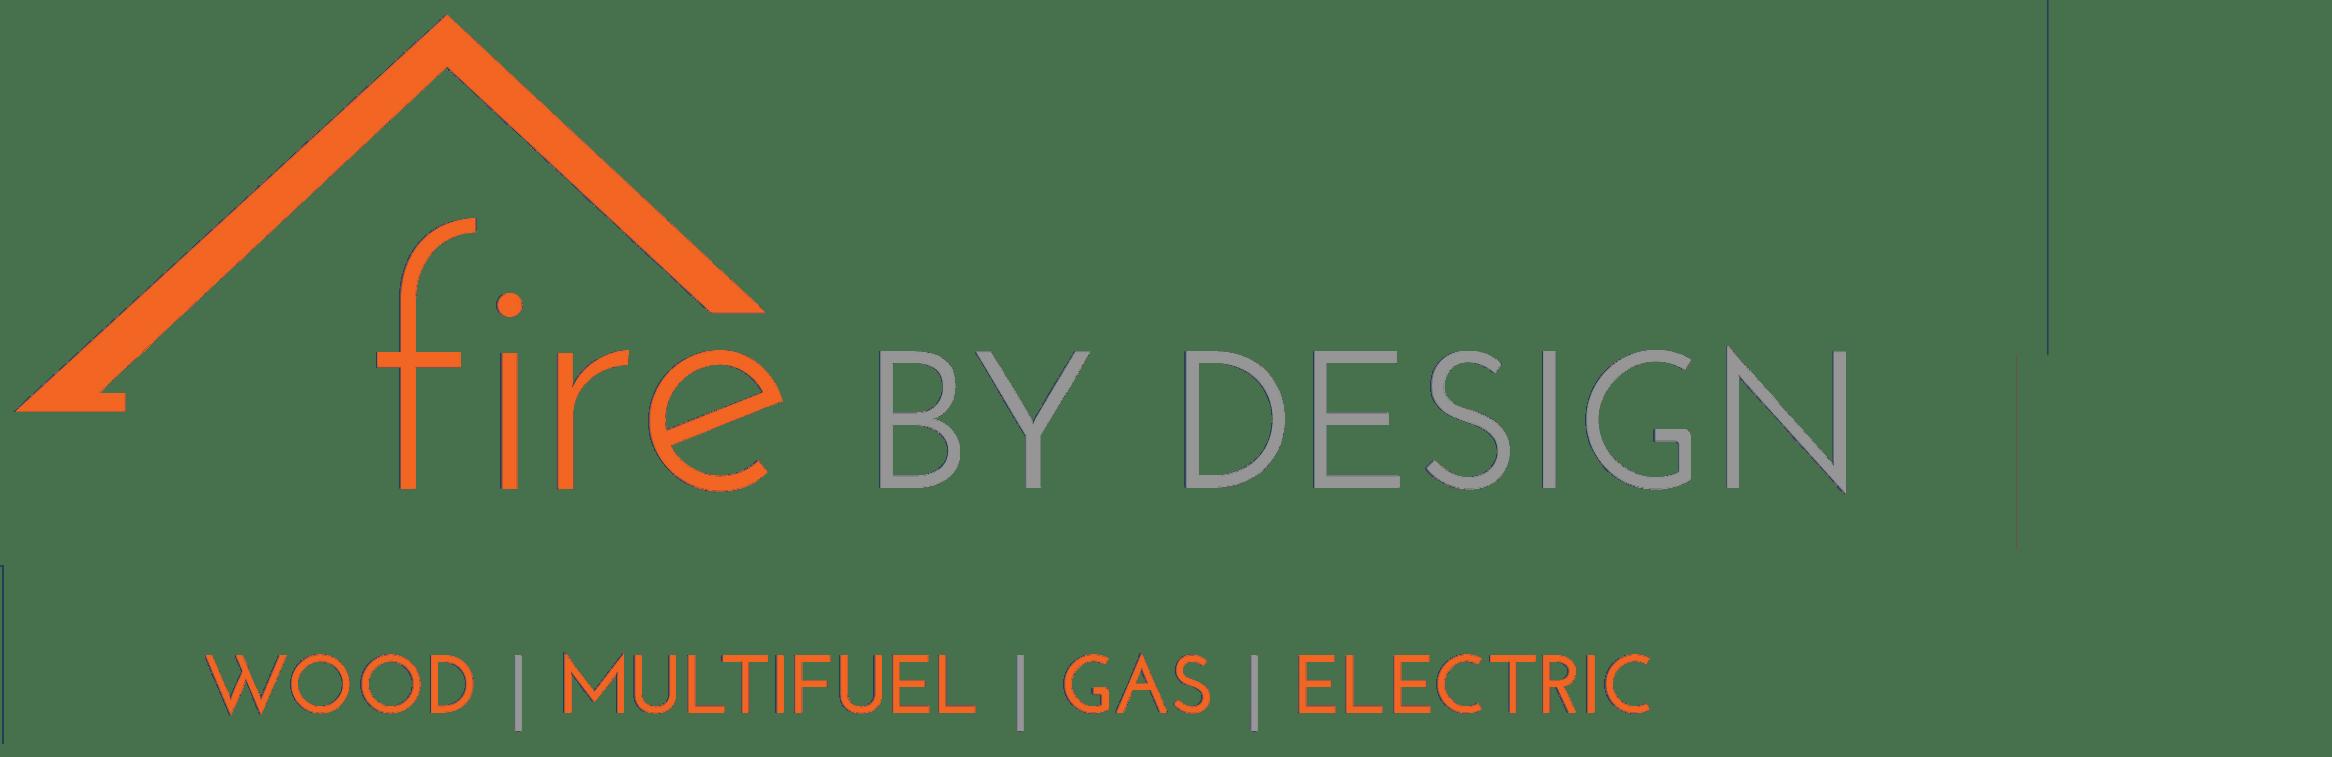 Fire By Design logo